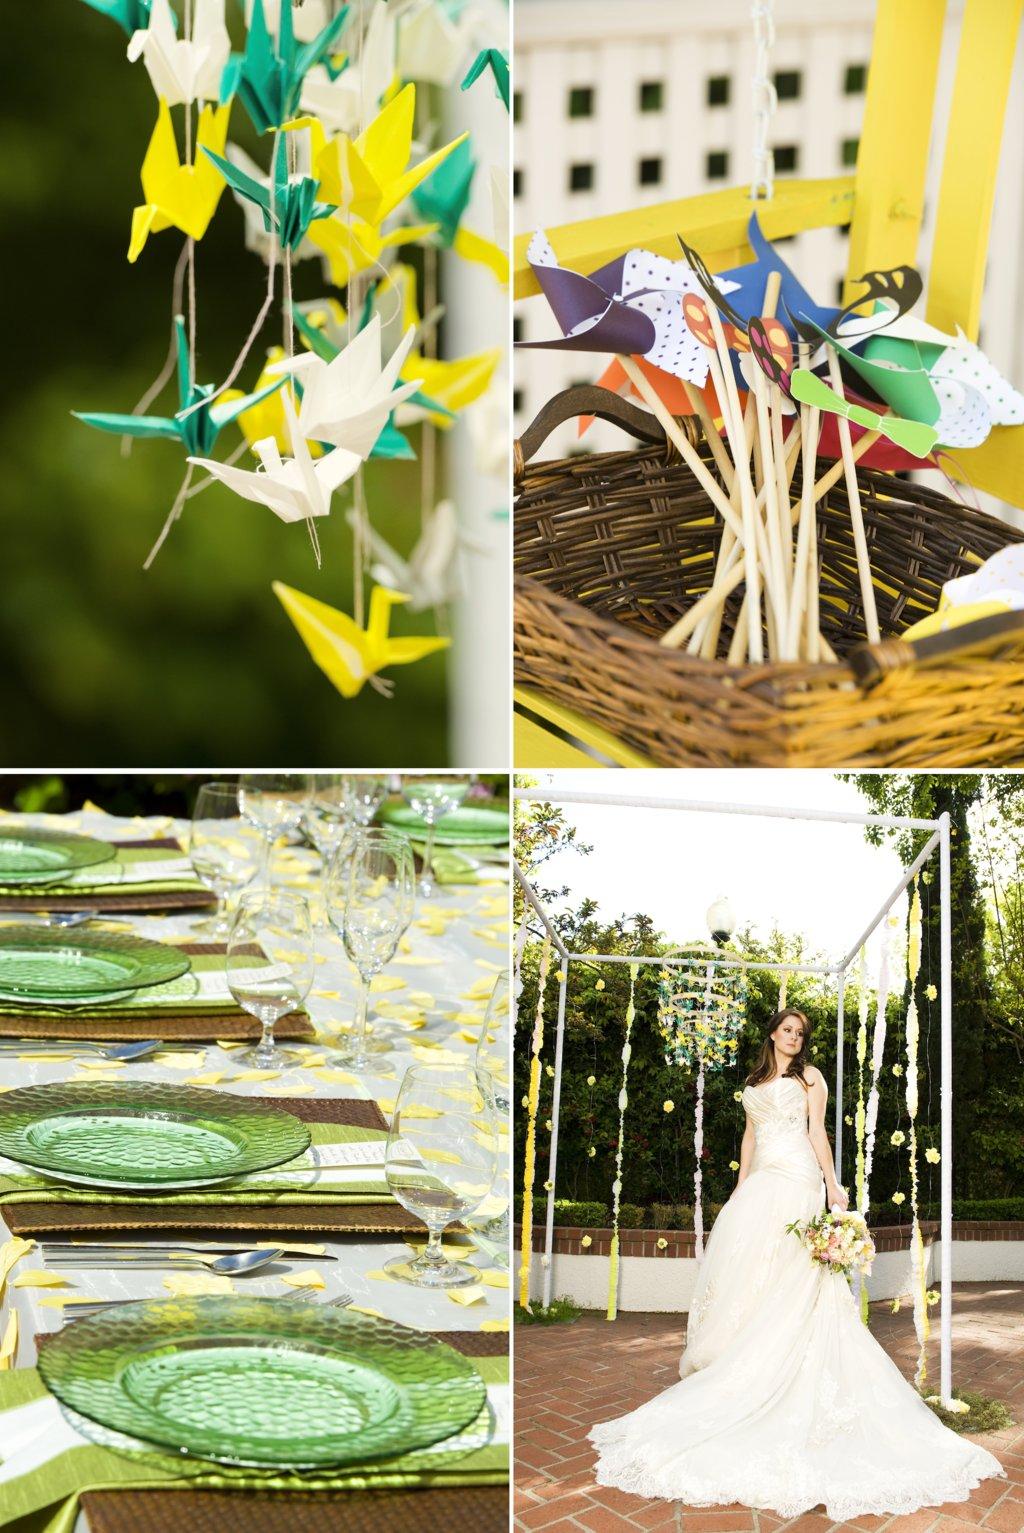 Whimsical-garden-wedding-paper-cranes-pinwheels.full